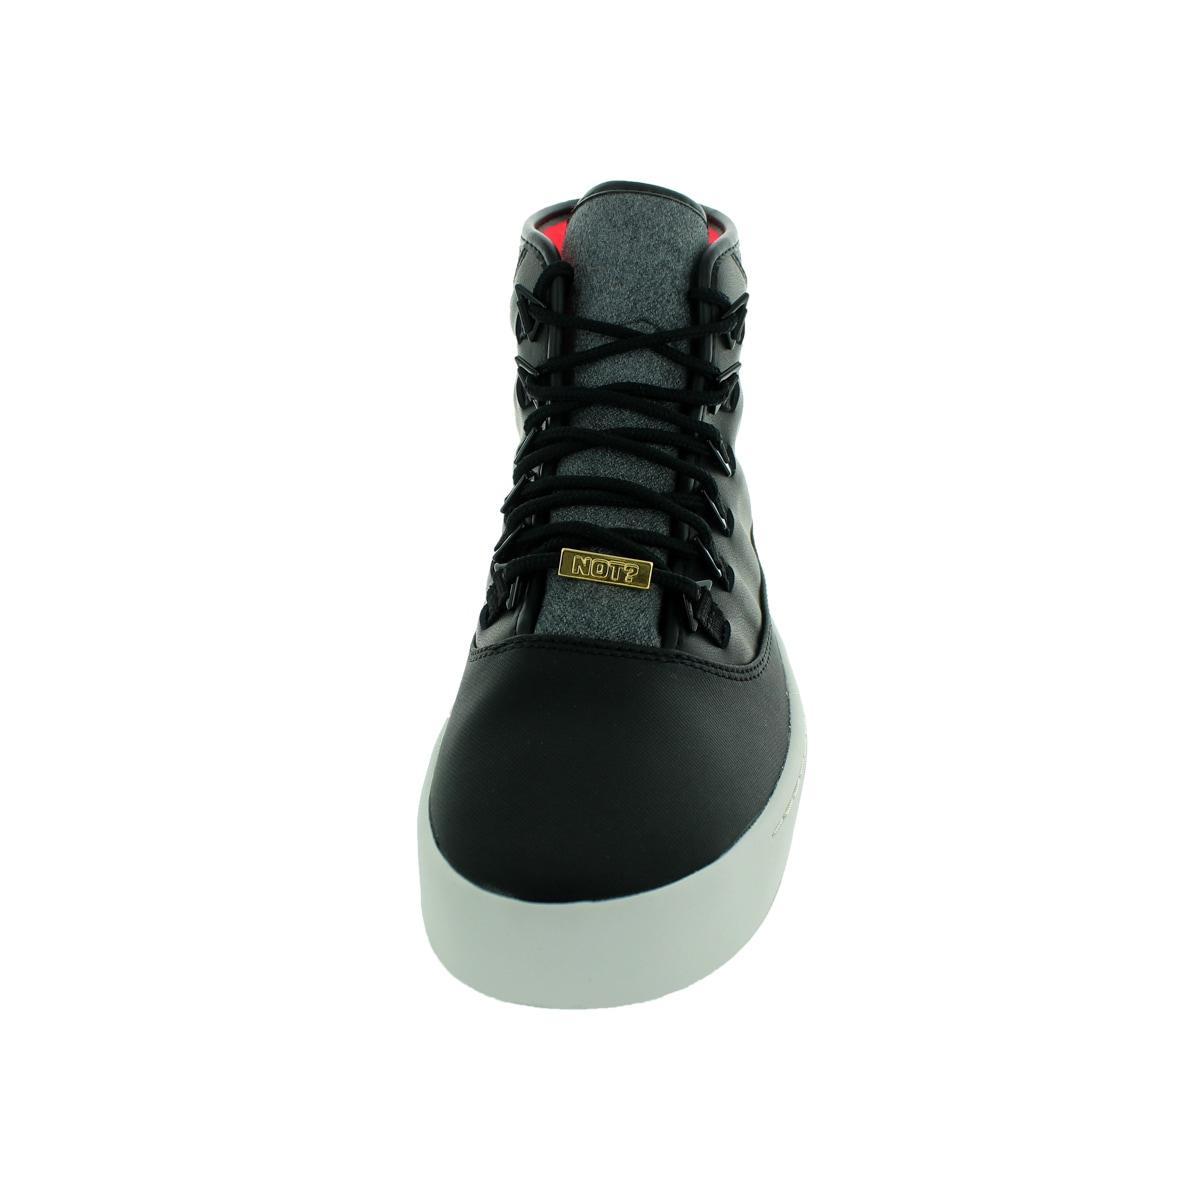 best website 4b6ab 7fd33 Shop Nike Jordan Men s Jordan Westbrook 0 Holiday Black Black  Casual Shoe  - Free Shipping Today - Overstock - 12318248